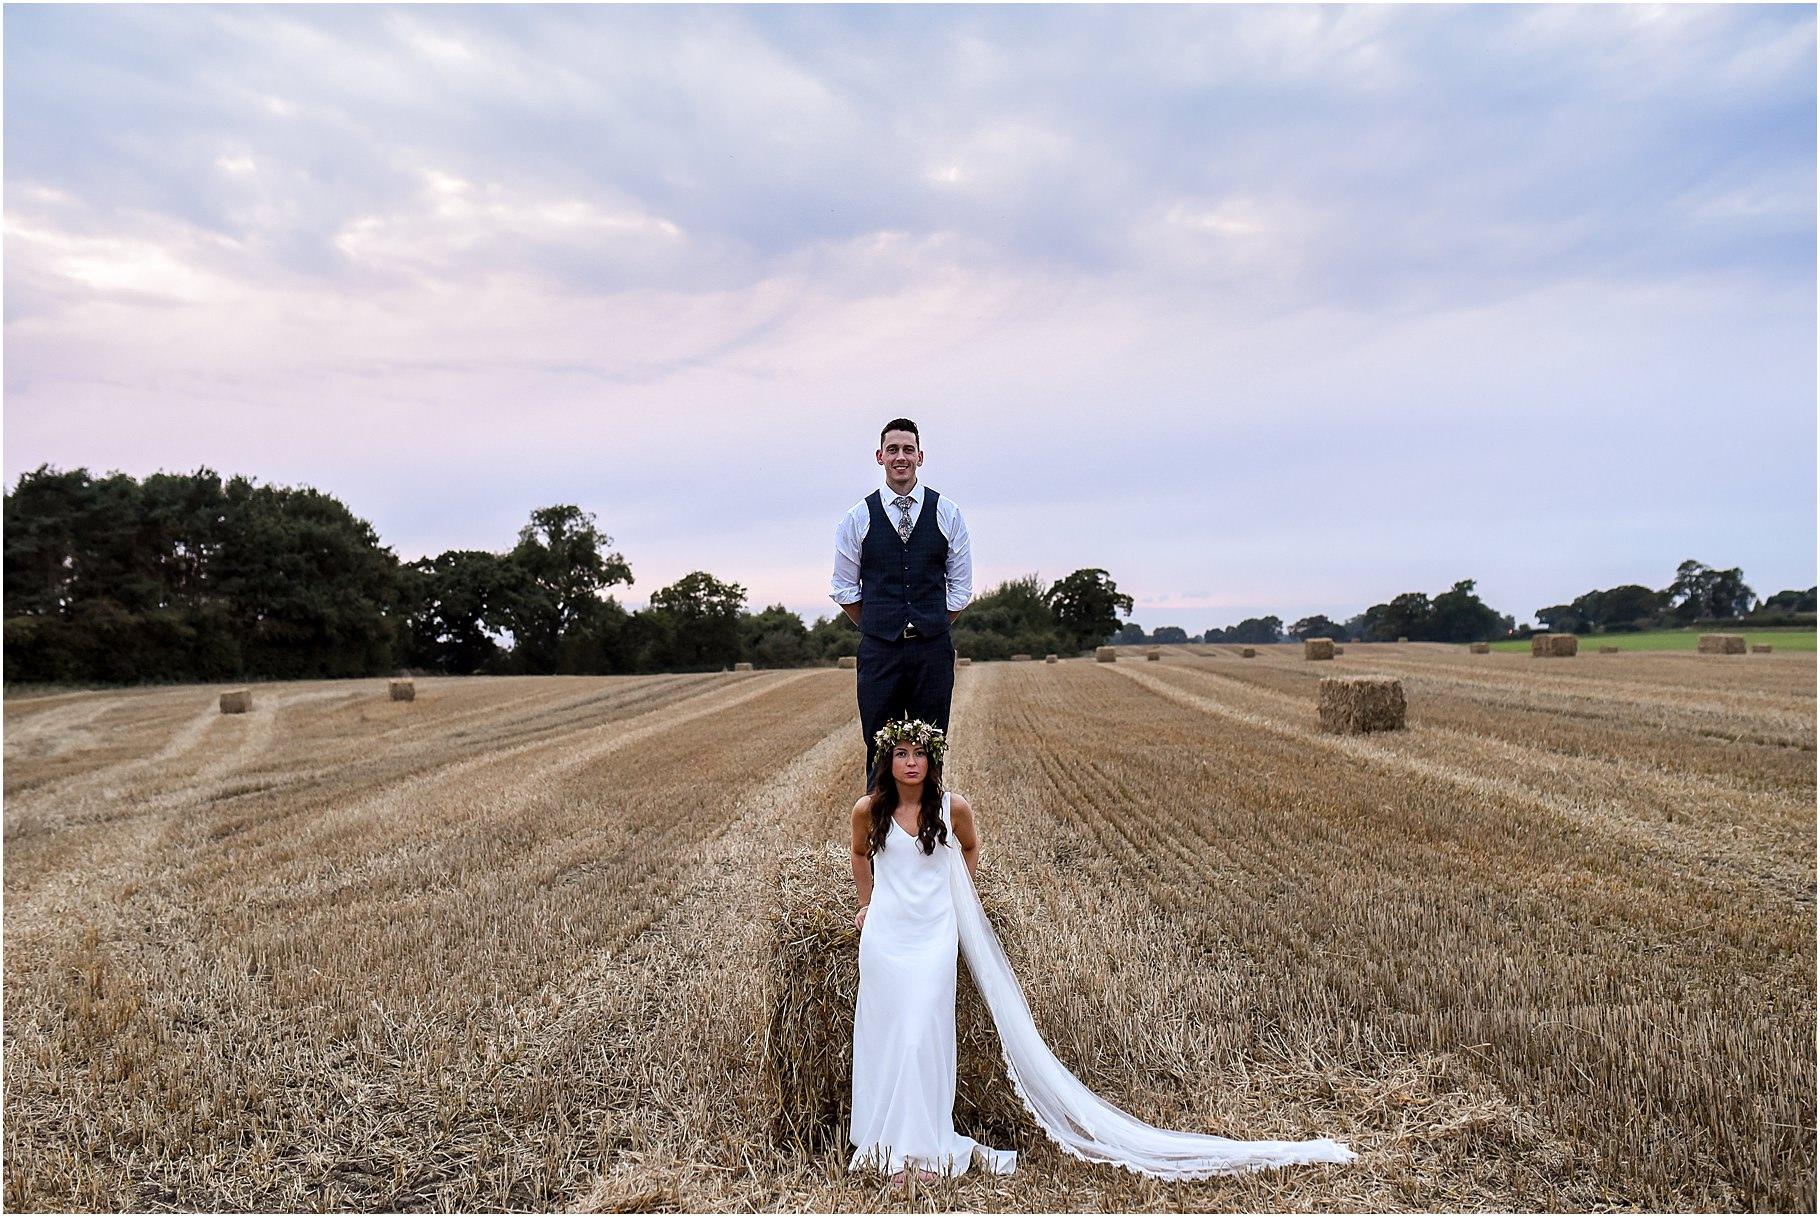 dan-wootton-photography-2017-weddings-070.jpg